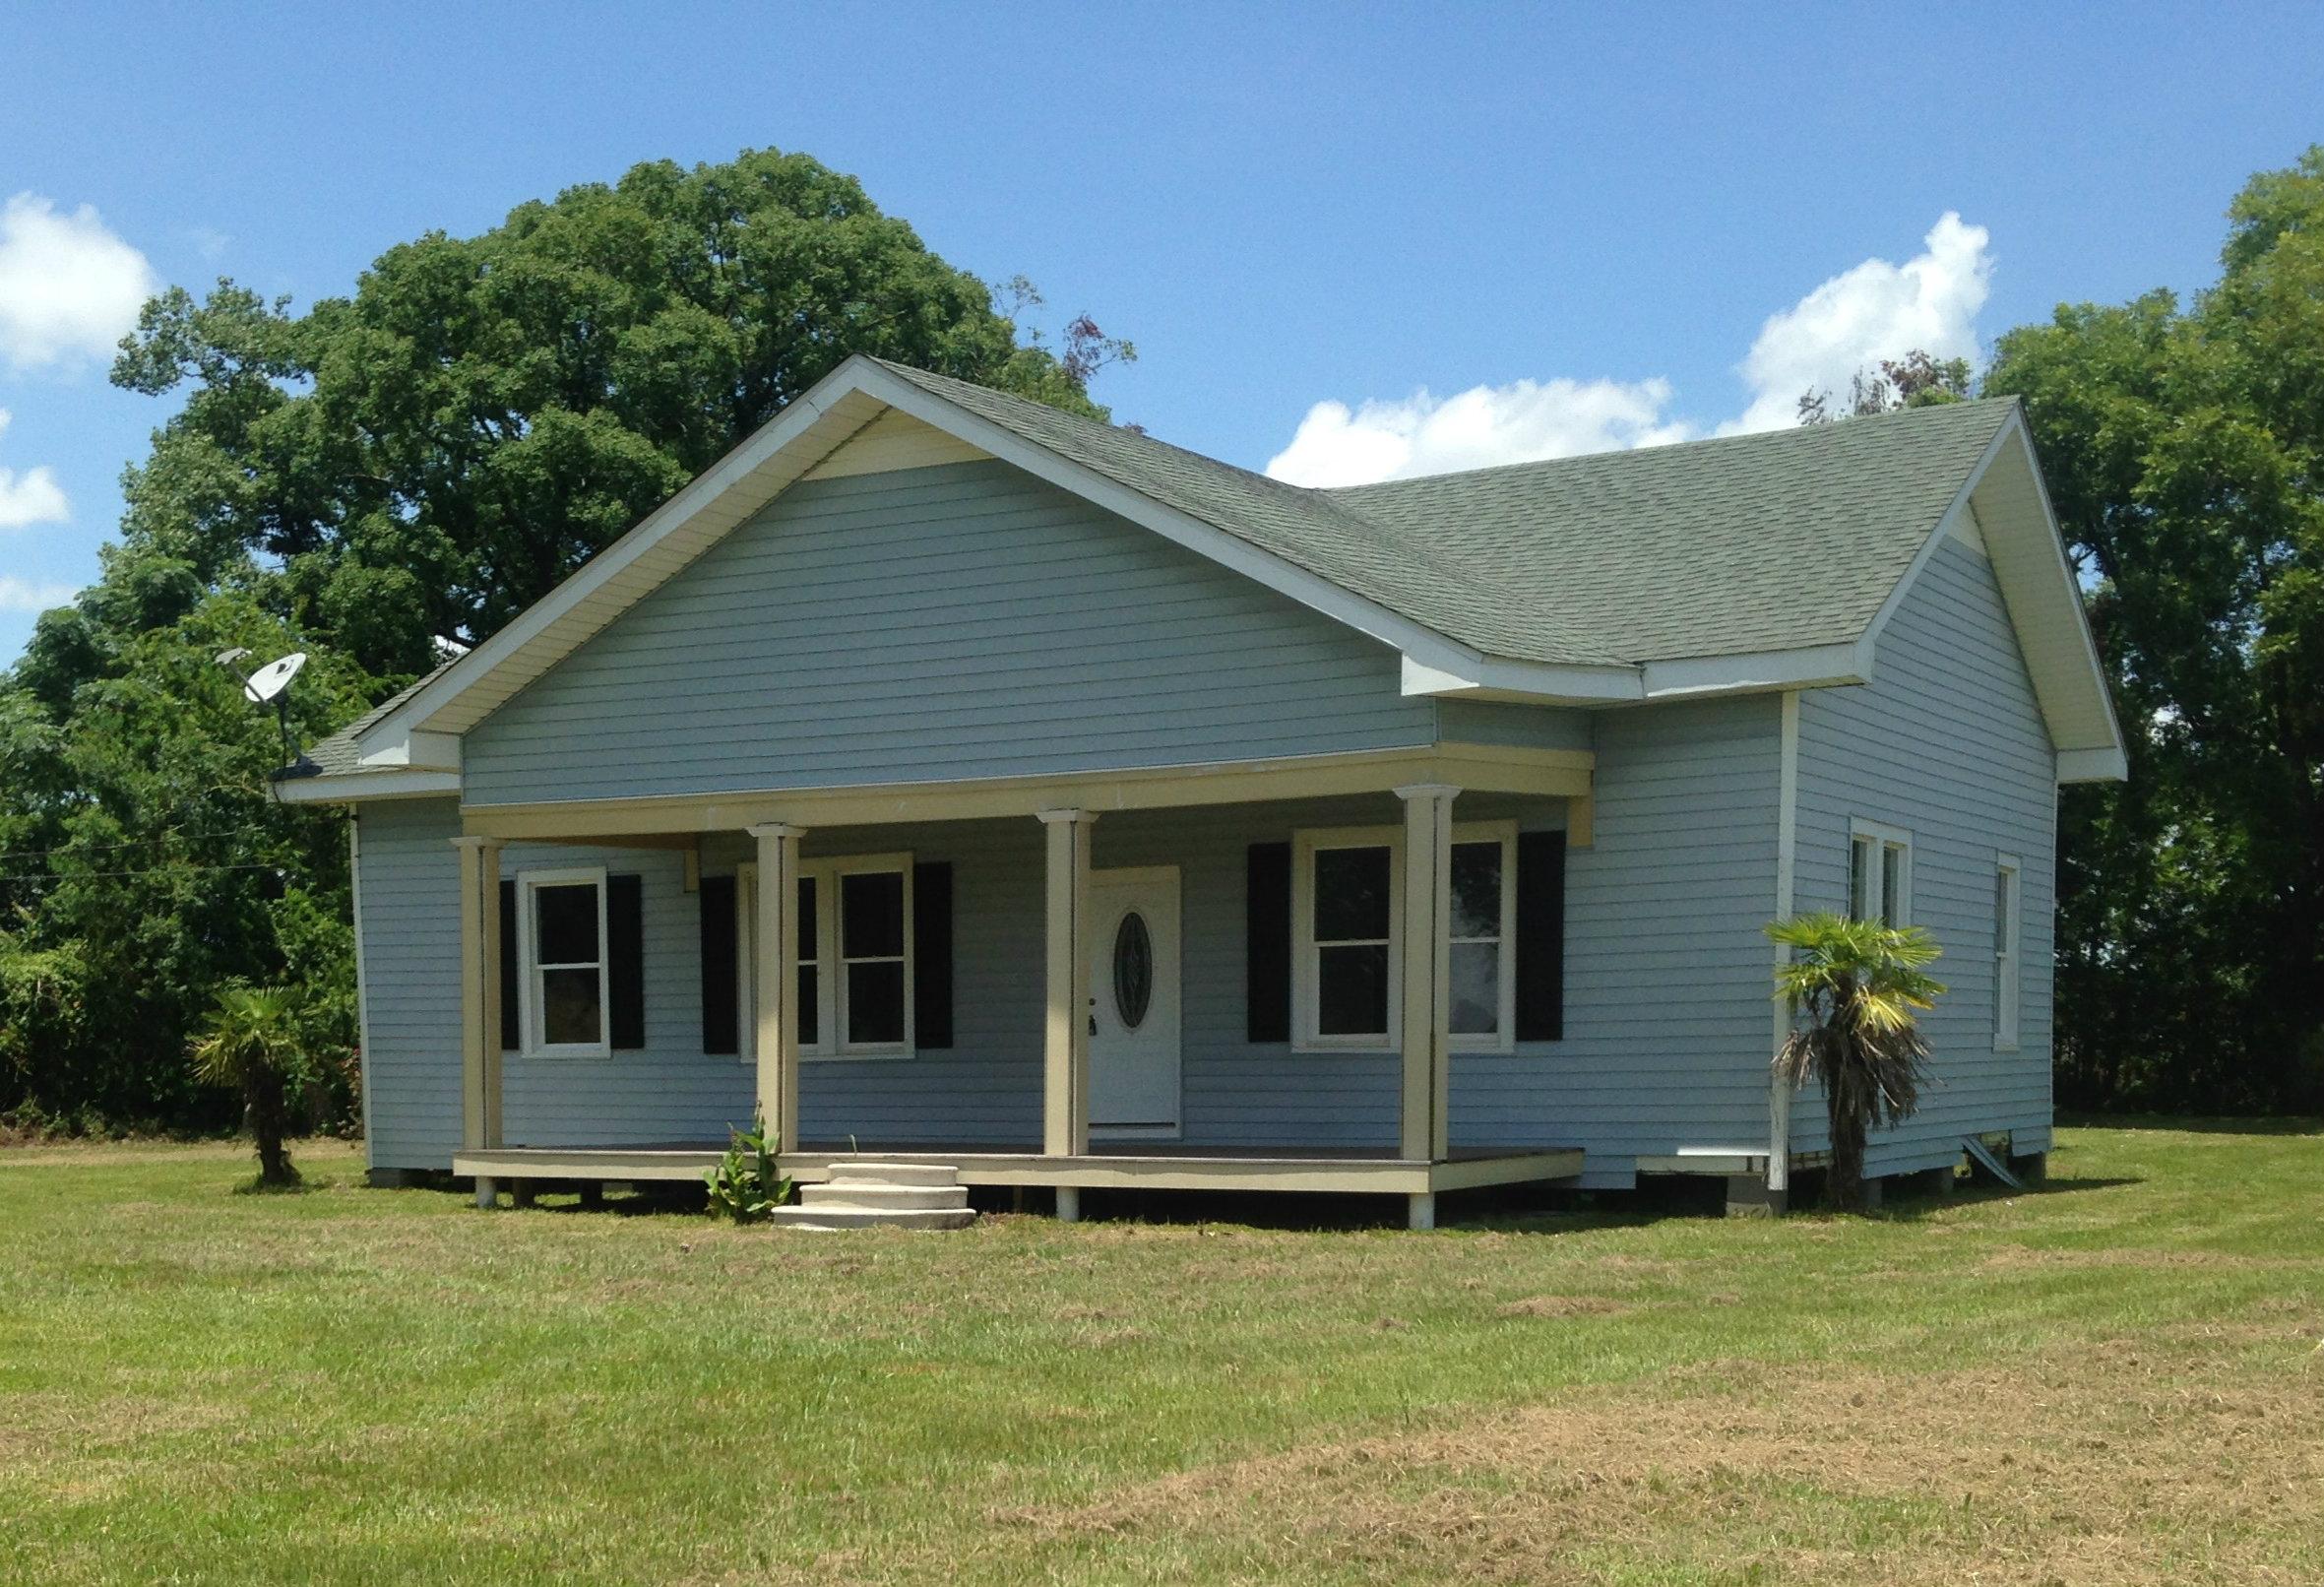 2814 W Willow St, Scott, Louisiana 70583